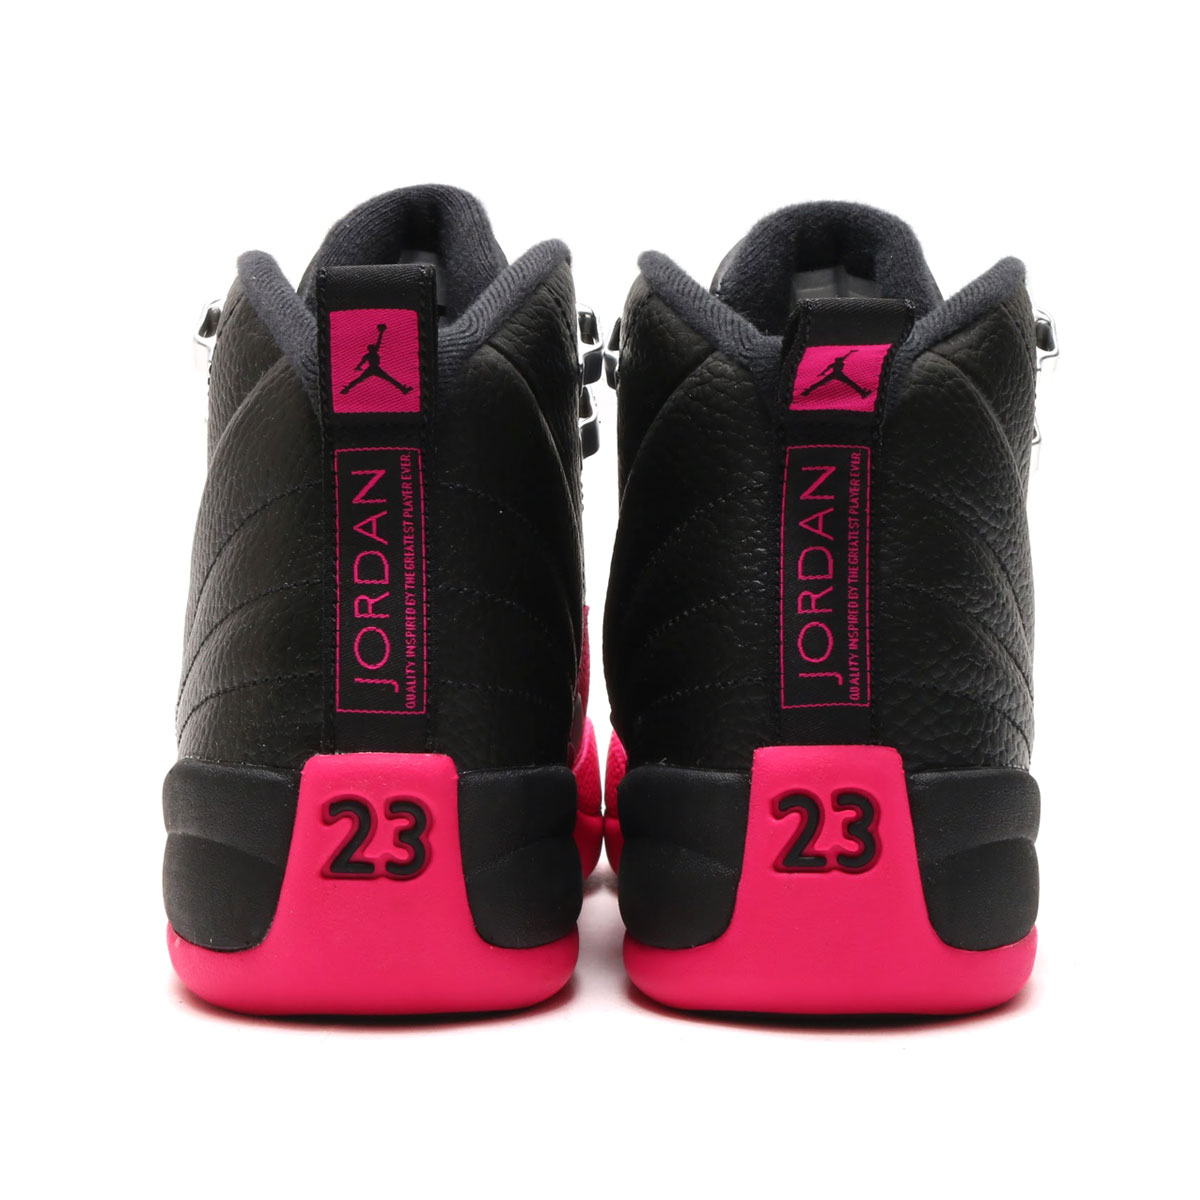 NIKE AIR JORDAN 12 RETRO GG (Nike Air Jordan 12 nostalgic GG) (BLACK/DEADLY  PINK-METALLIC SILVER) 17HO-S